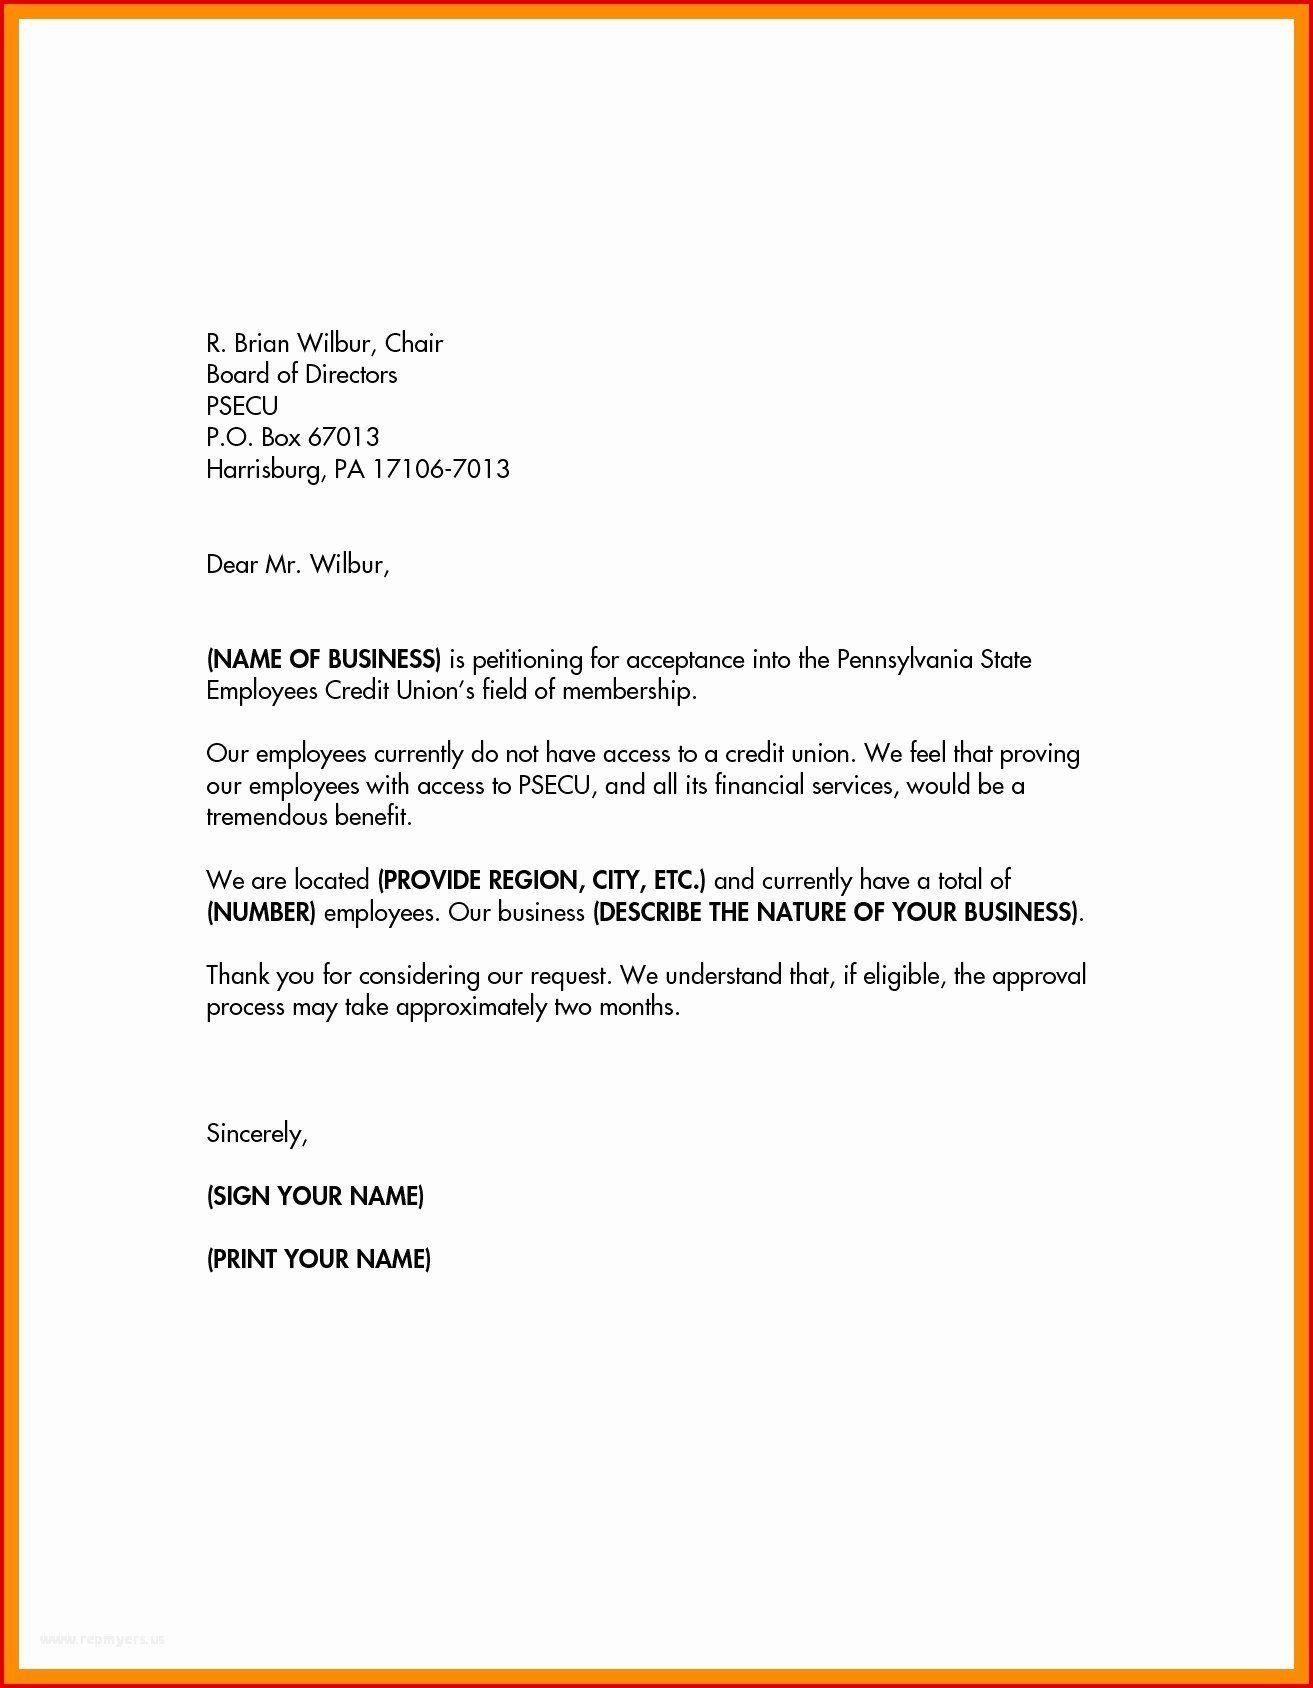 30 Niw Recommendation Letter Sample In 2020 Letter Of